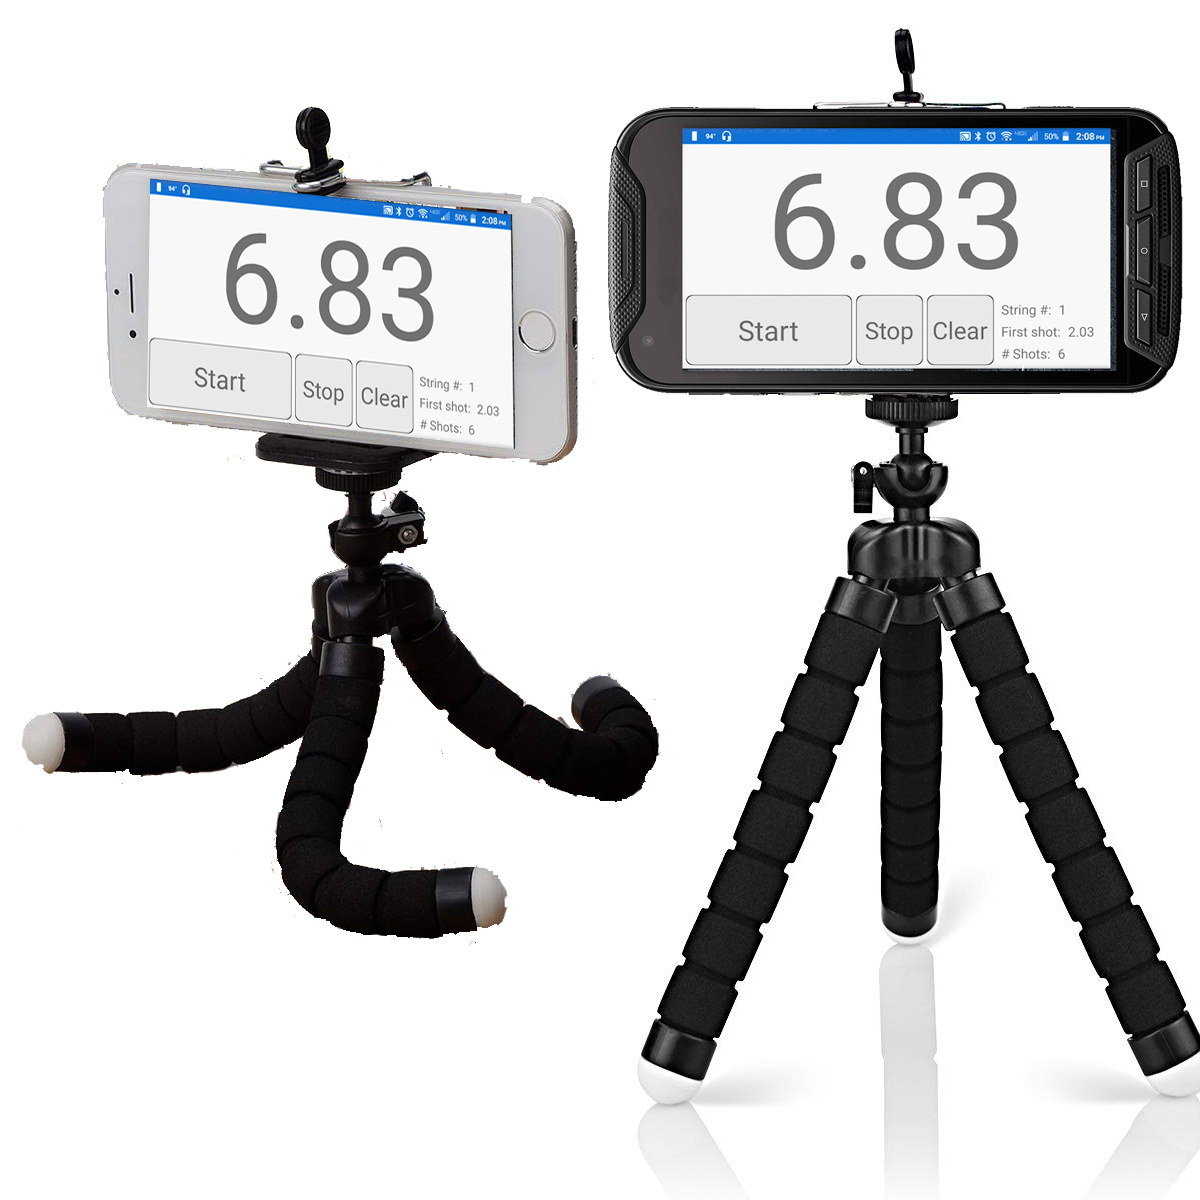 Mini Portable Tripod With Phone Mount